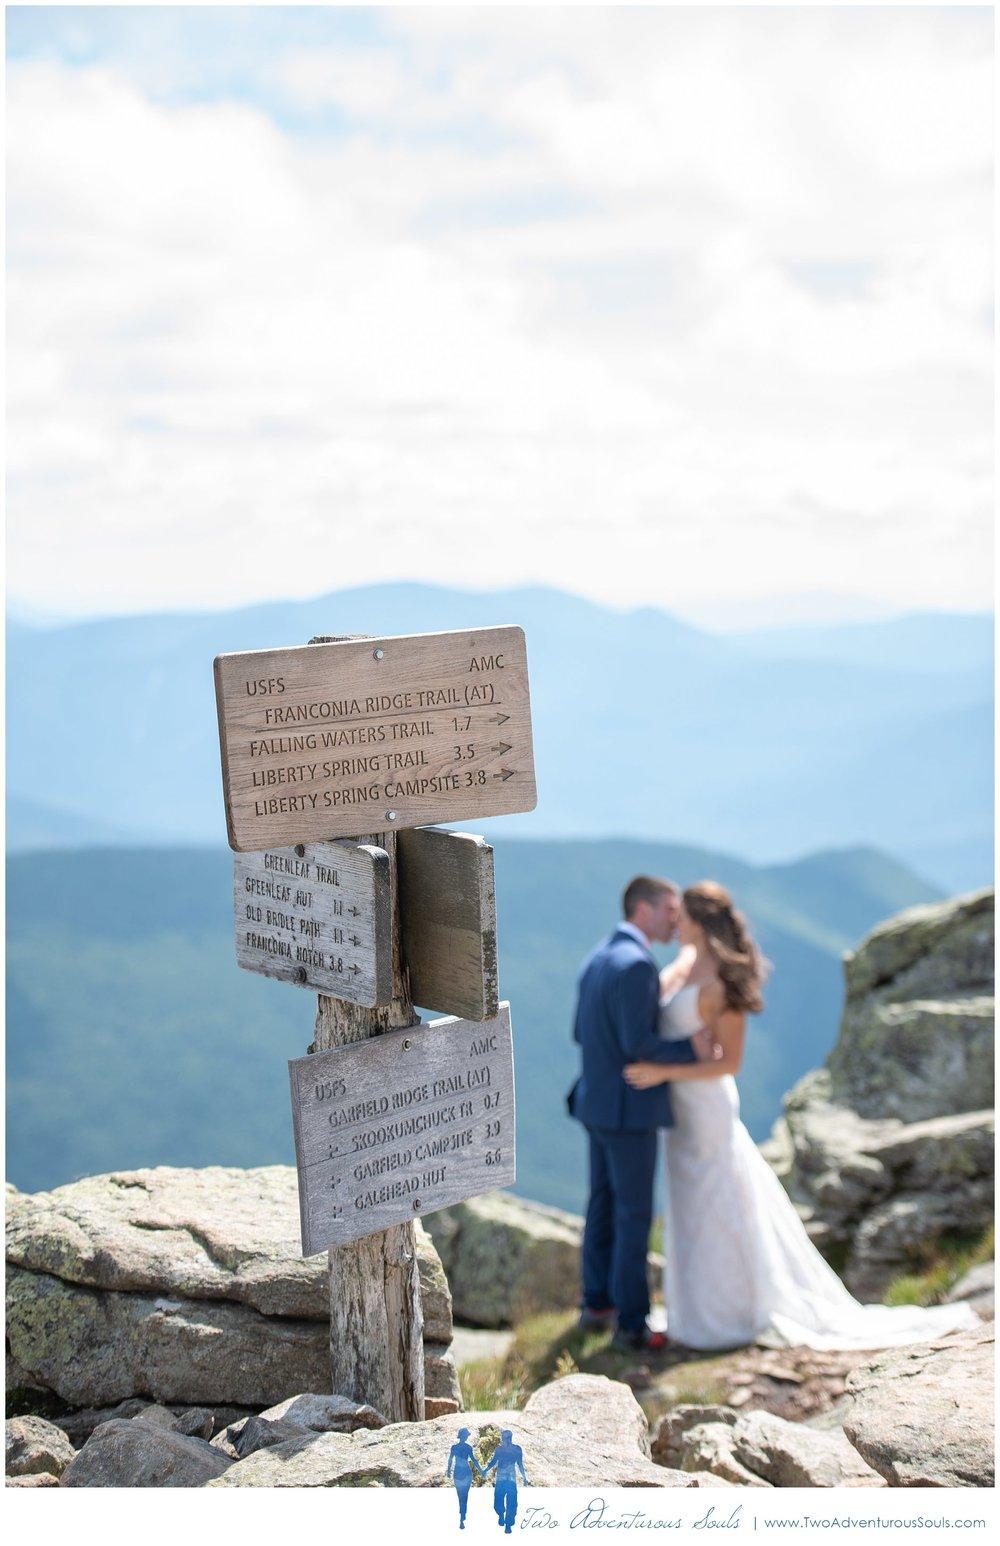 081818-Chana-Kevin-Adventure-Wedding-Photographers-Destination-Wedding-Photographers14.jpg